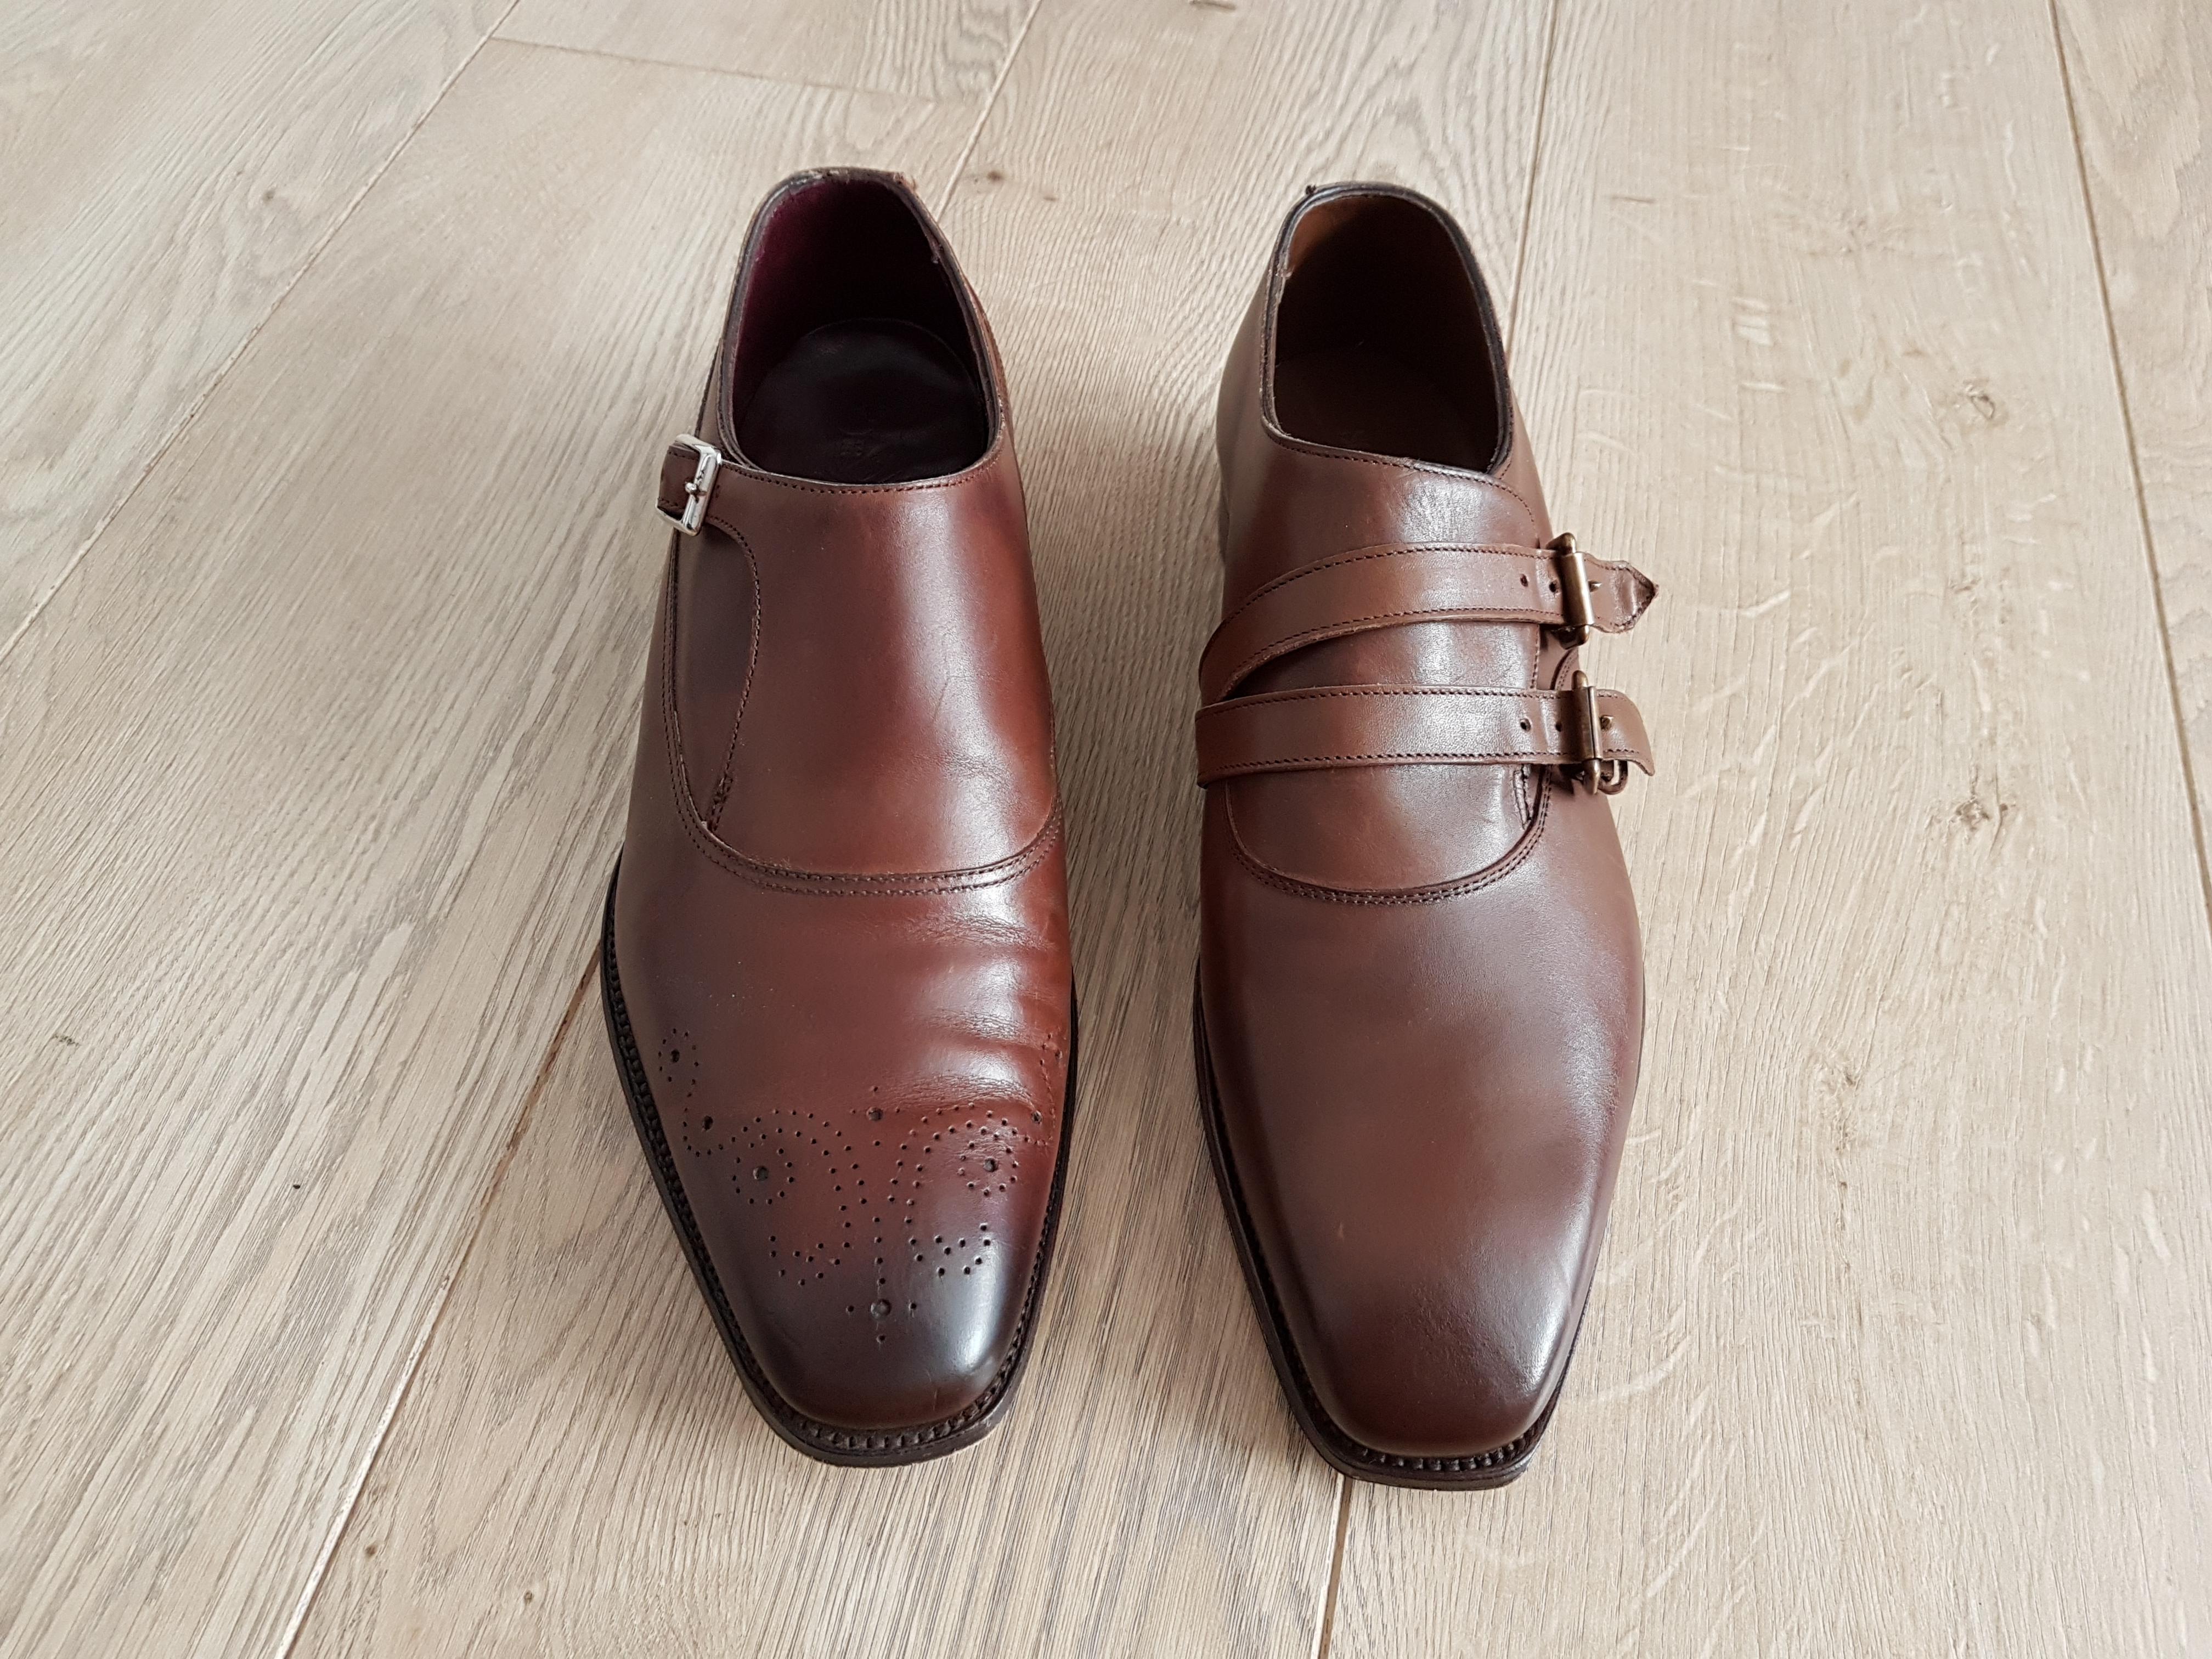 Schweino's photos in Herring Shoes - Experiences?